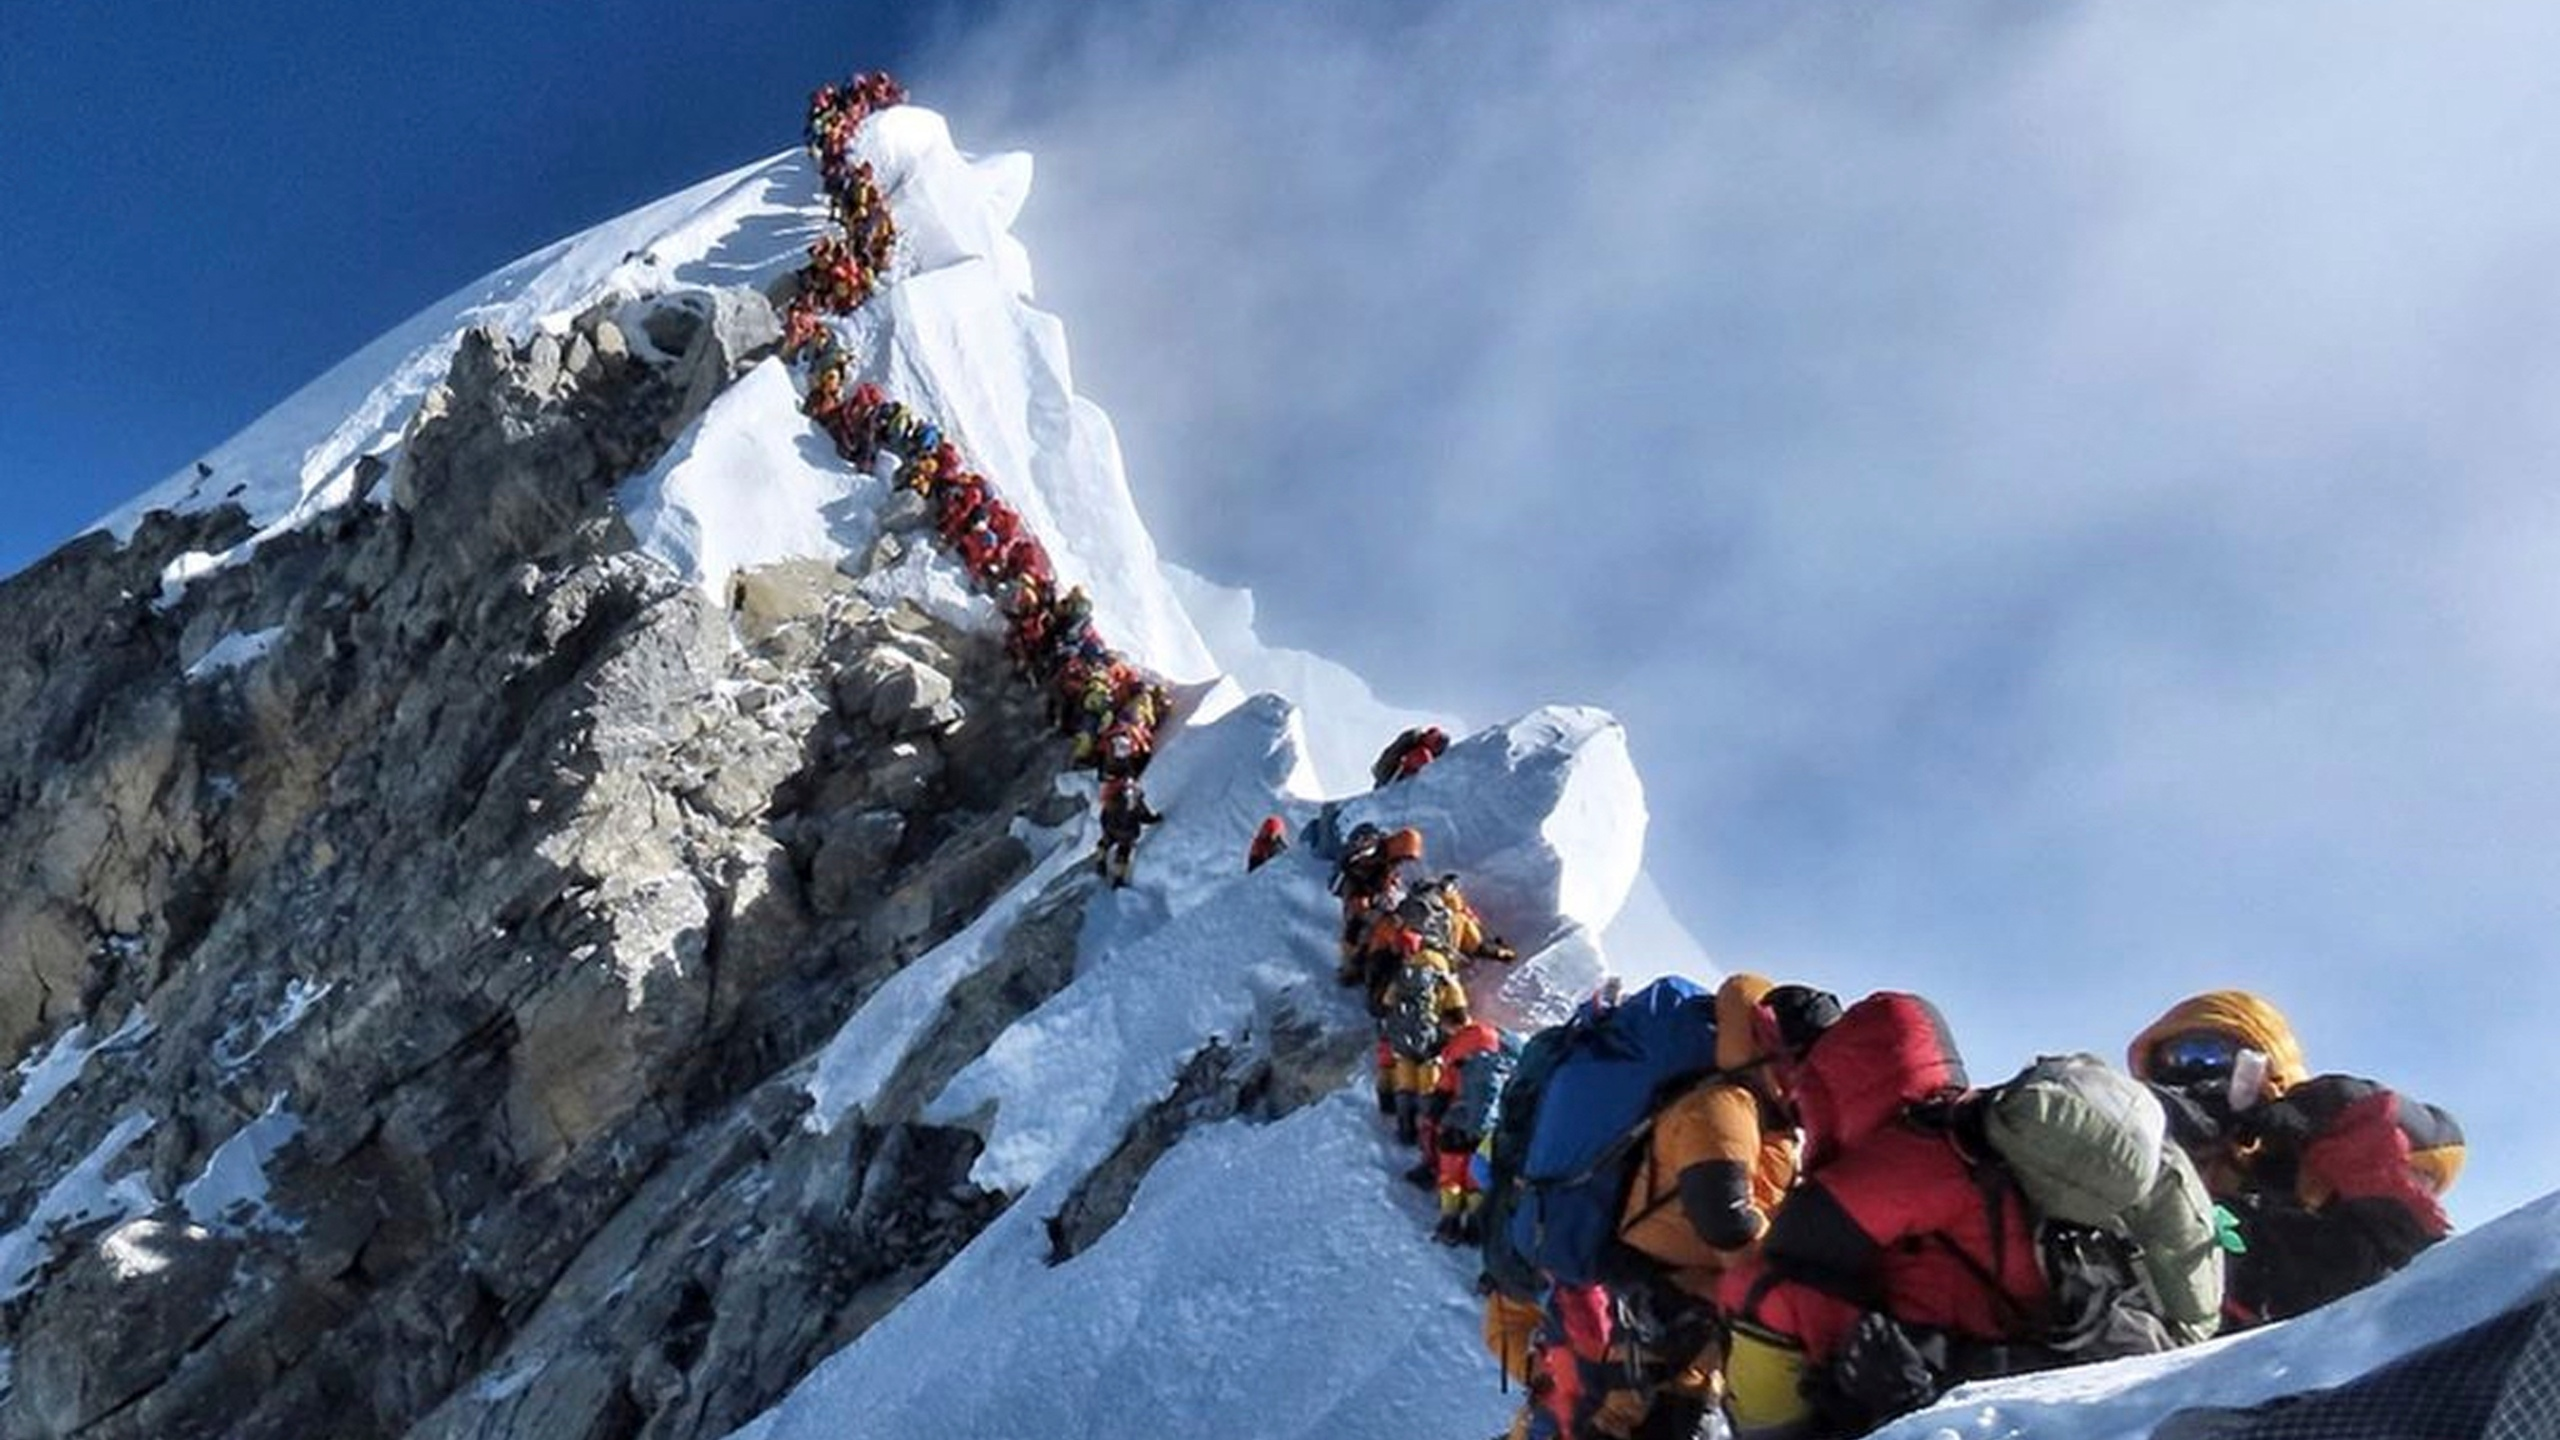 APTOPIX_Everest_Death_58892-159532.jpg44602527